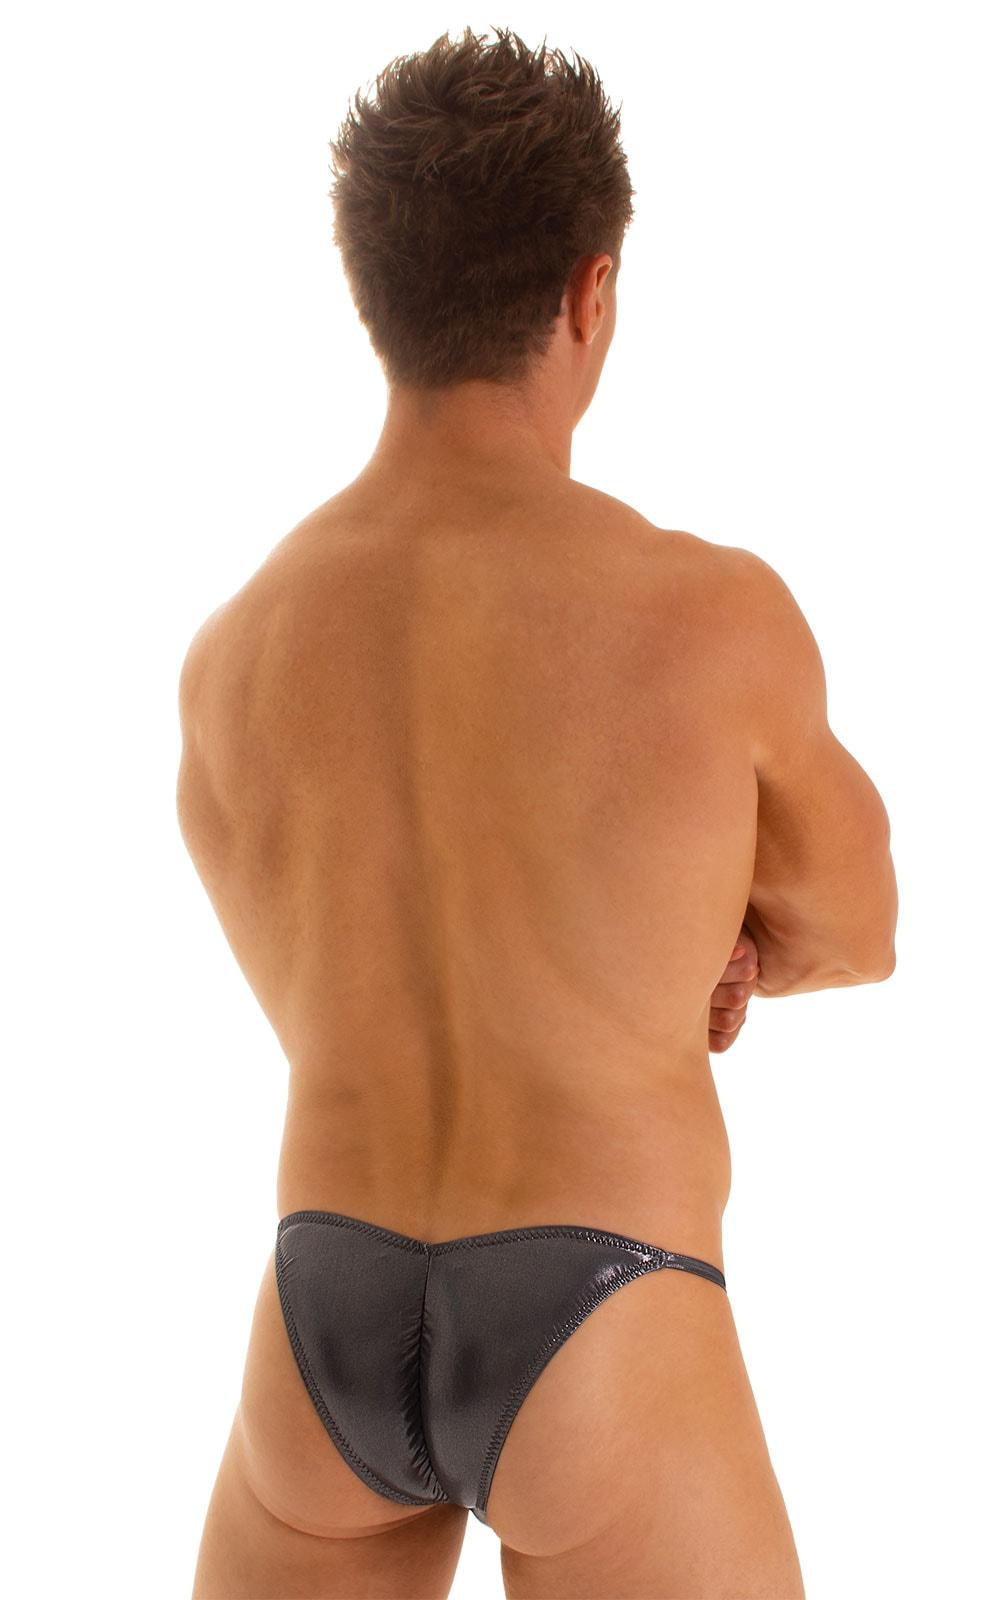 Micro Pouch - Puckered Back - Rio Bikini in Black Ice 2